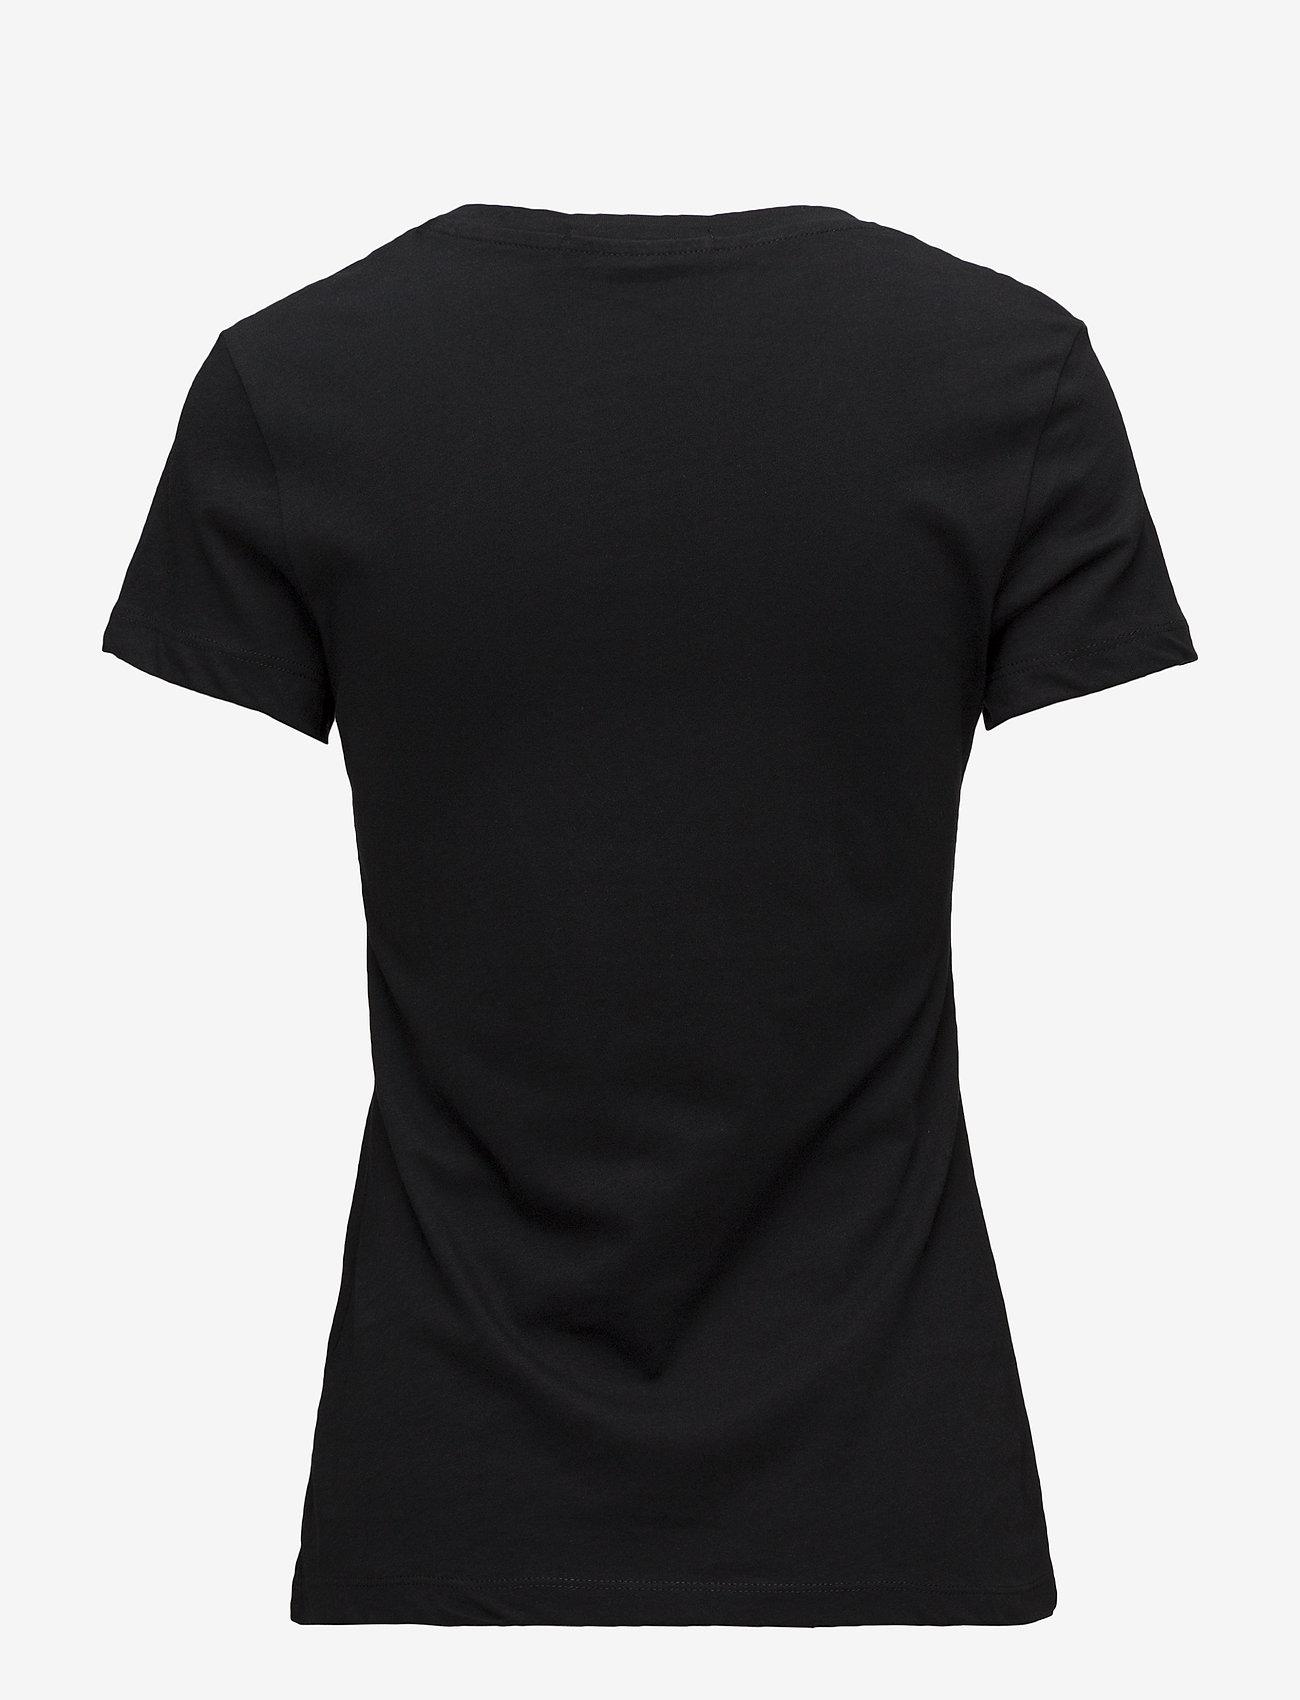 Calvin Klein Jeans - CORE INSTITUTIONAL L - logo t-shirts - ck black